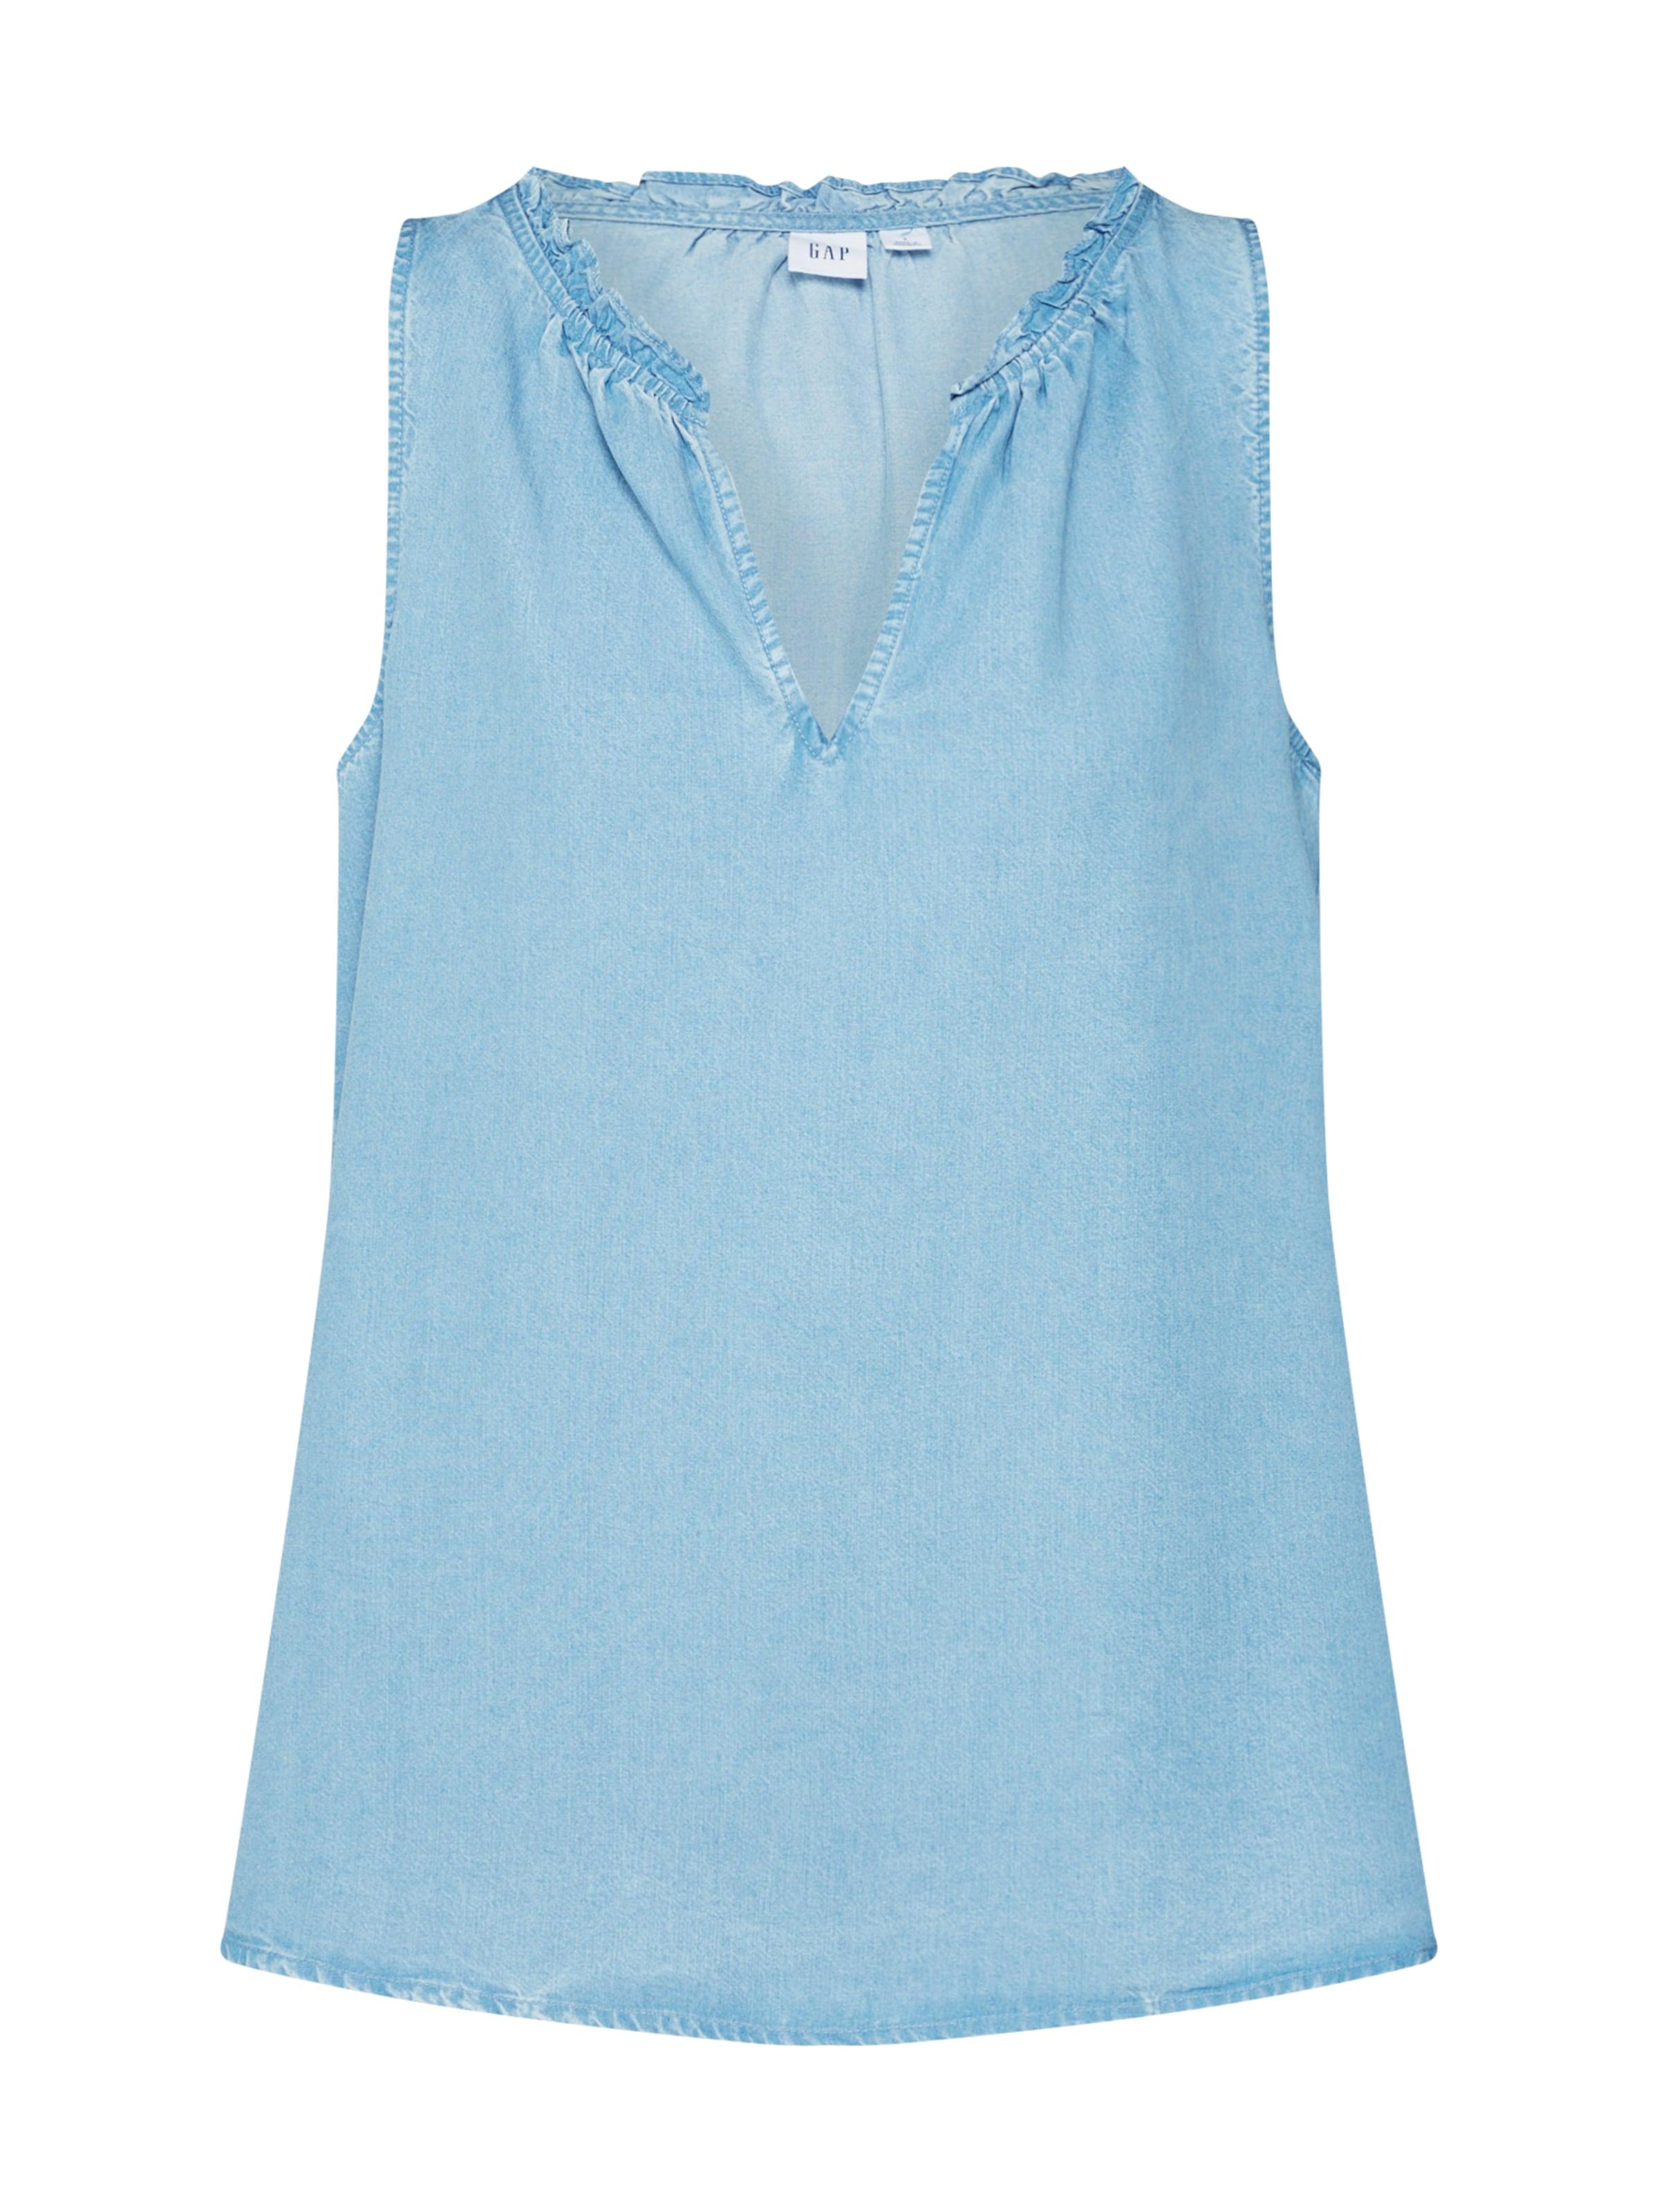 T Gap Denim shirt Bleu En DHWE29I